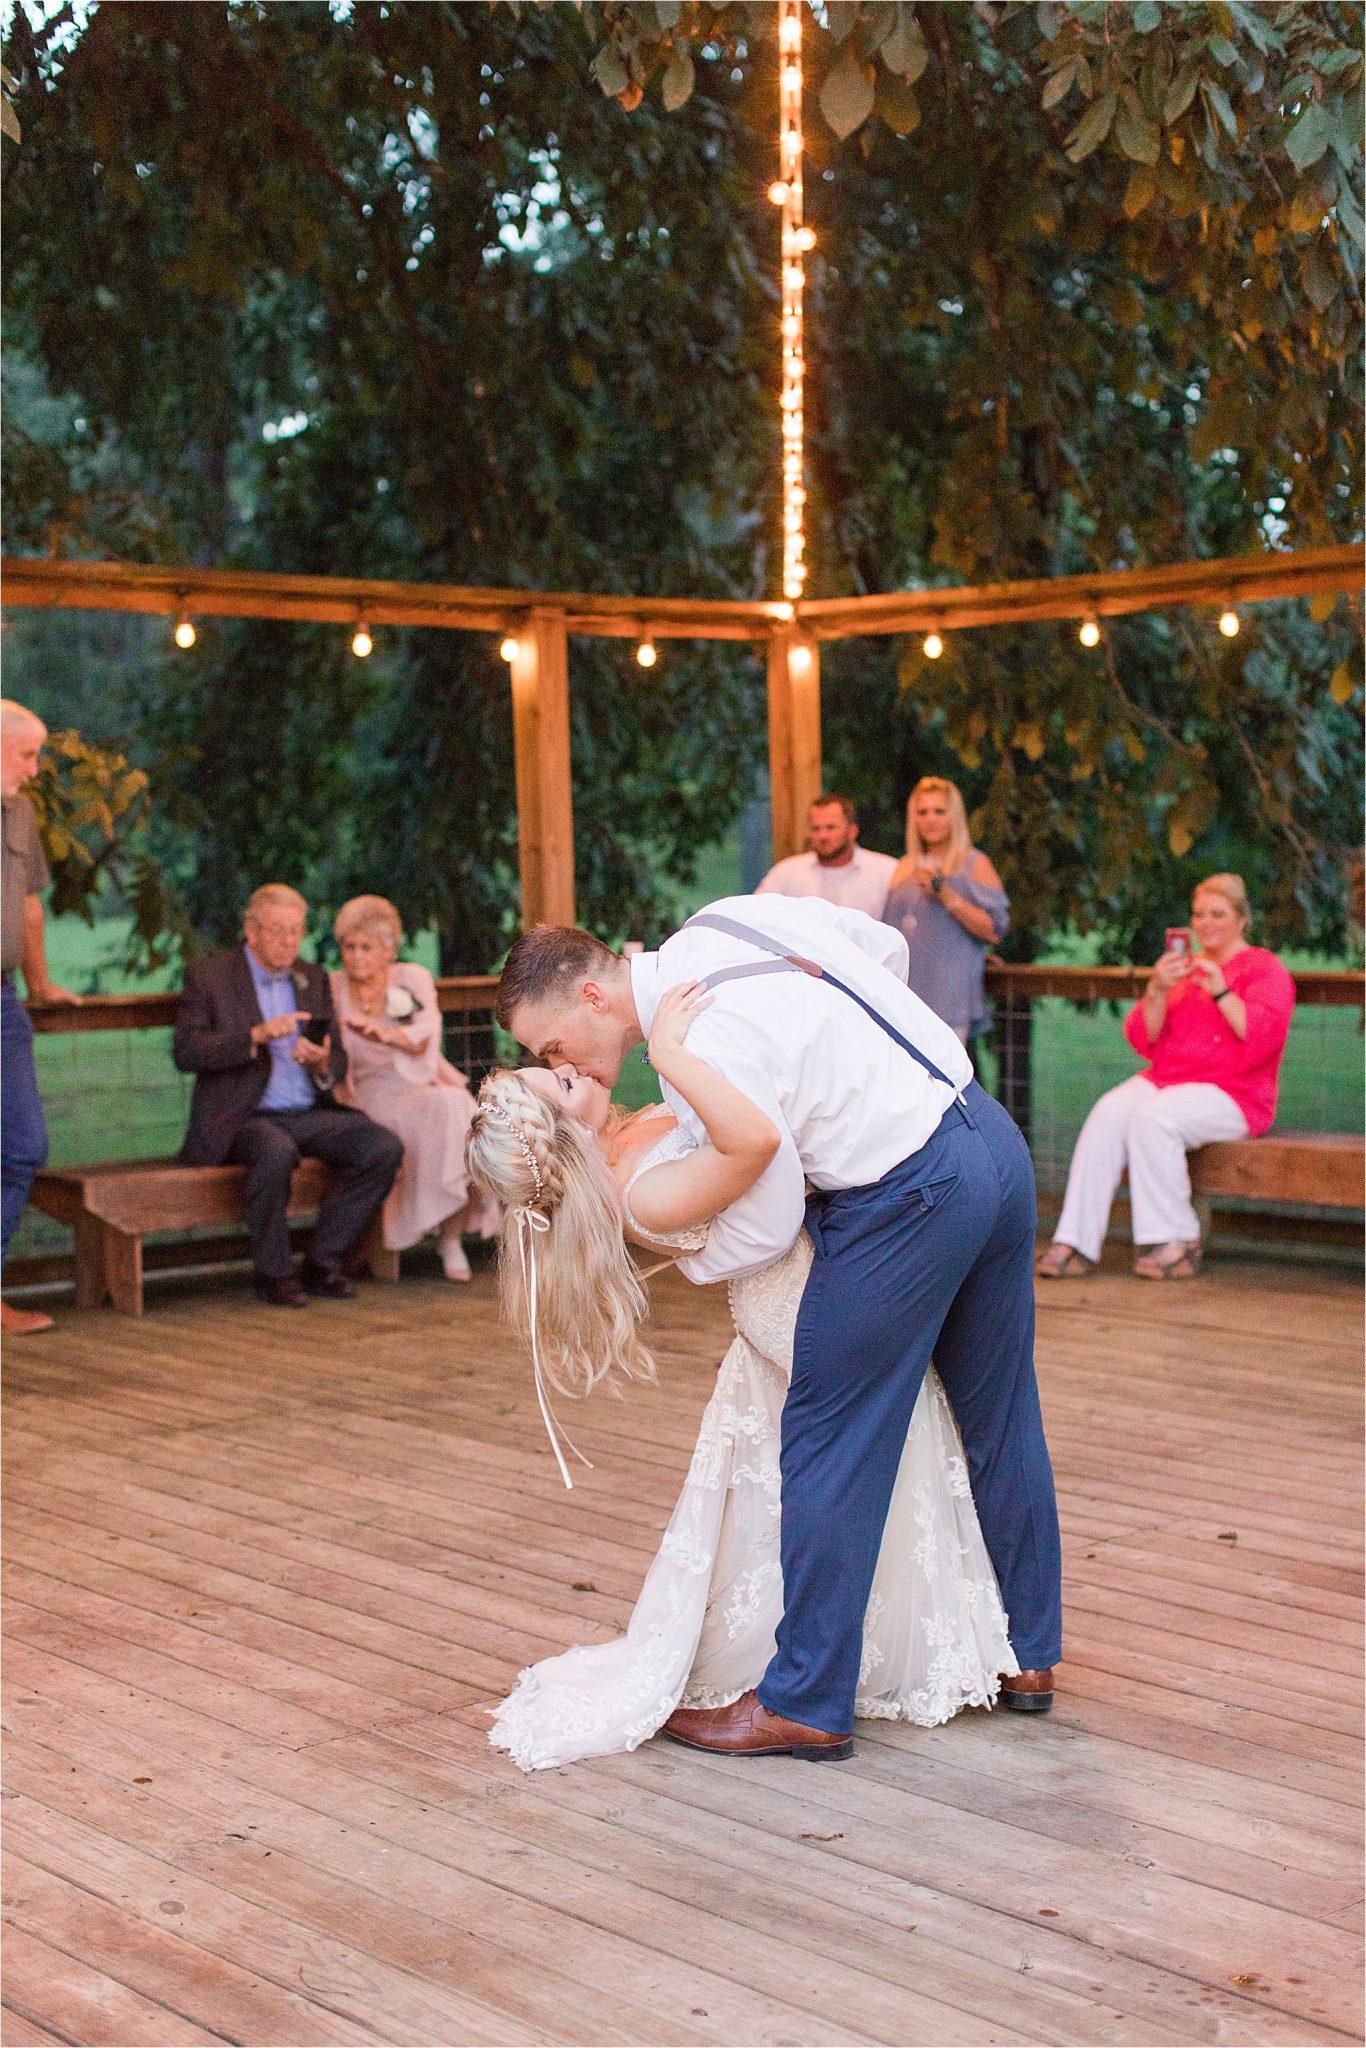 bride-groom-first-dance-dipping-kiss-wedding-reception-dance-floor